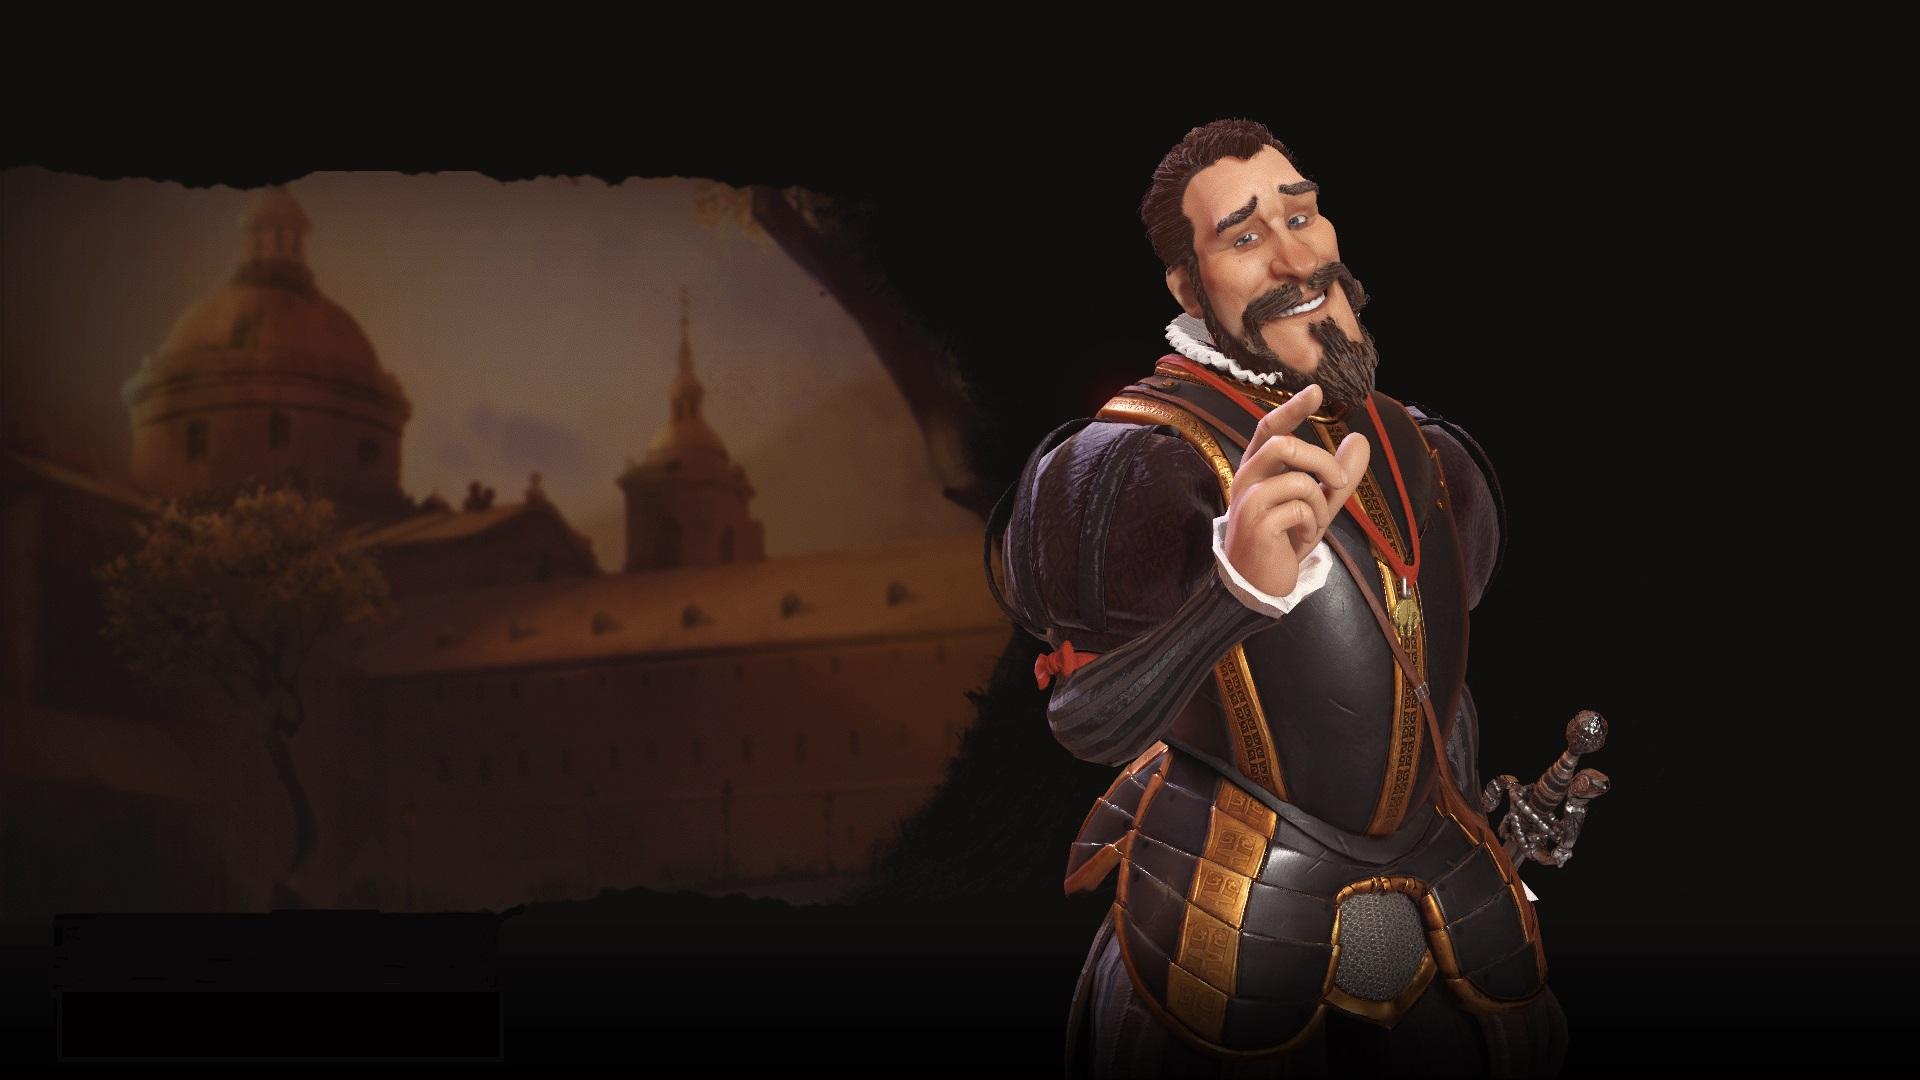 Civilization 6's big April balance patch has dropped – here's what it changes